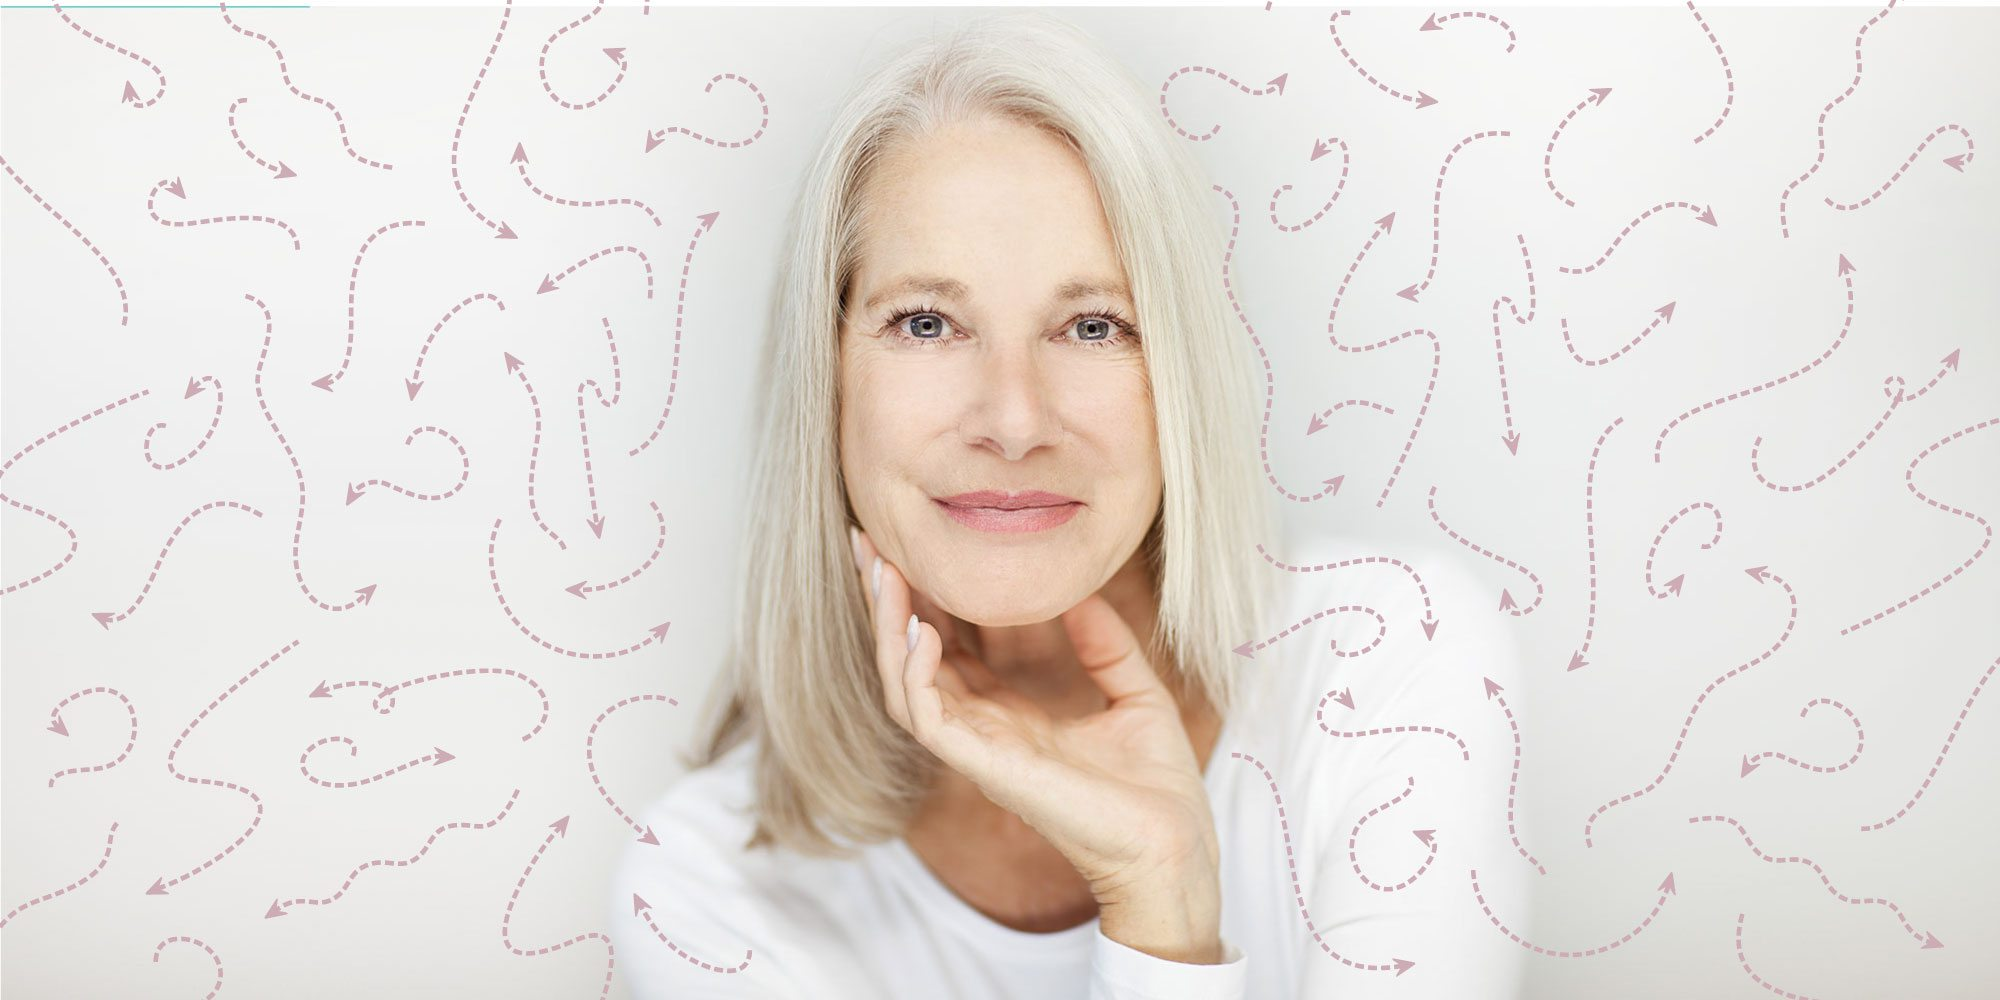 Skincare older woman